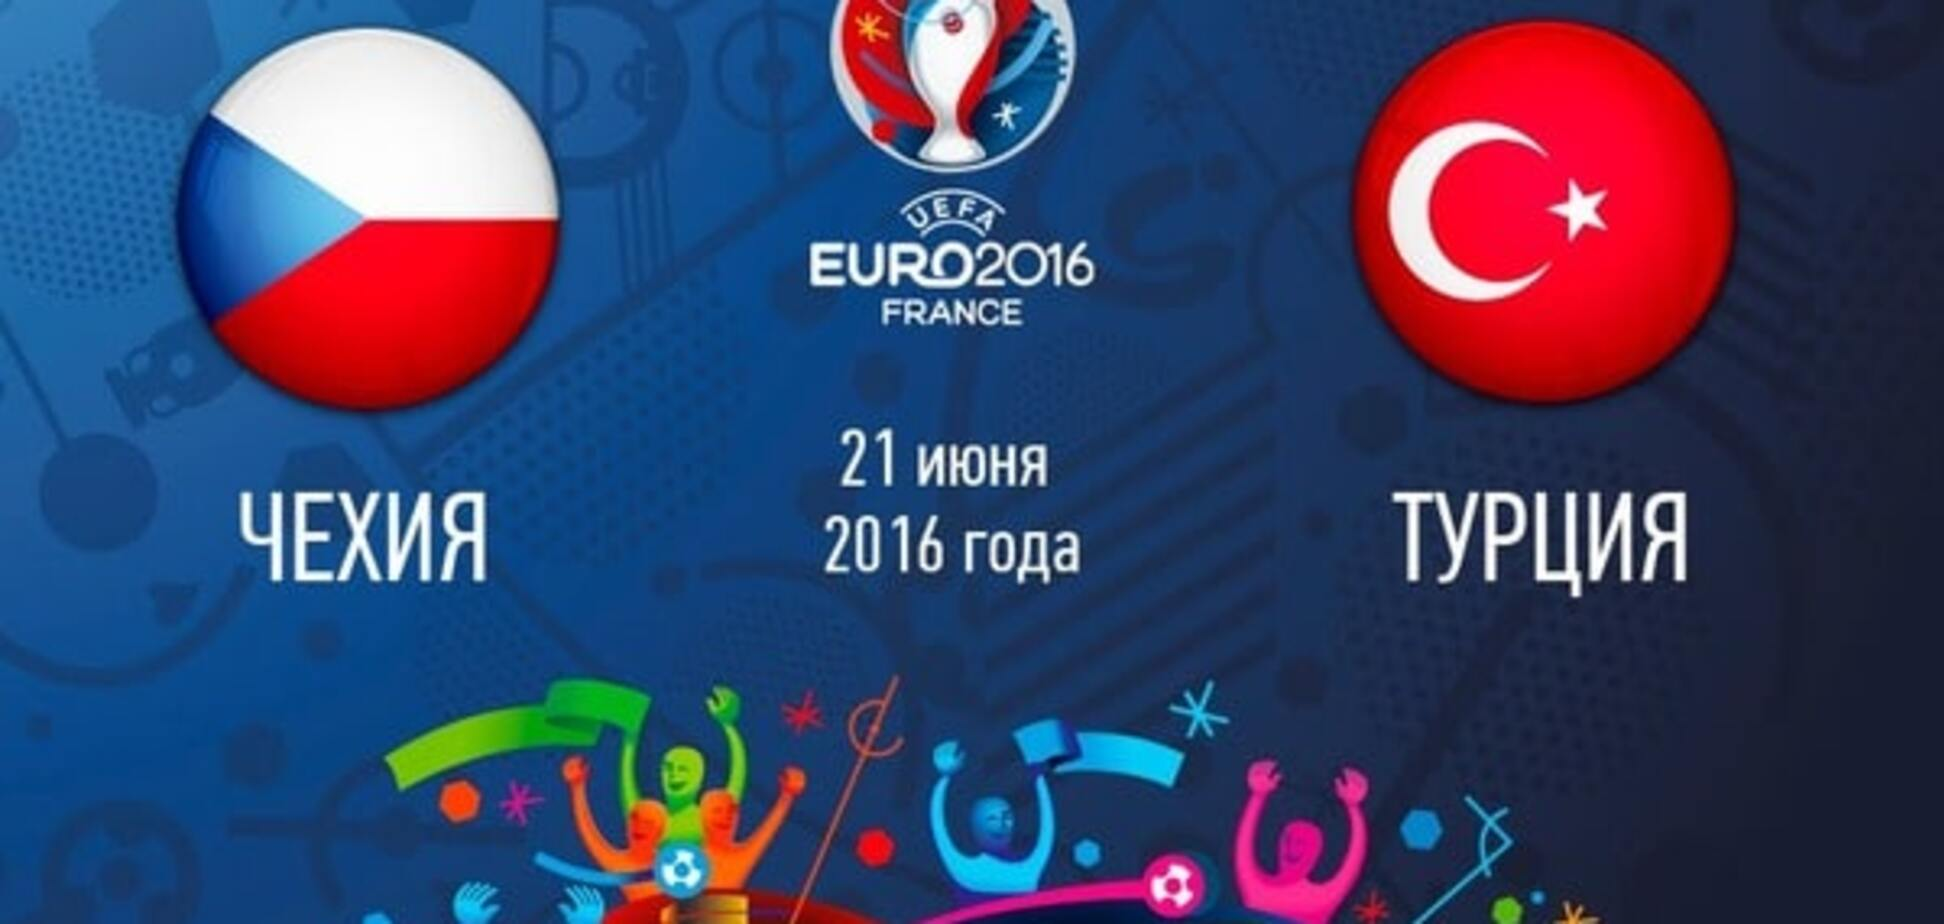 Чехия - Турция евро2016 онлайн